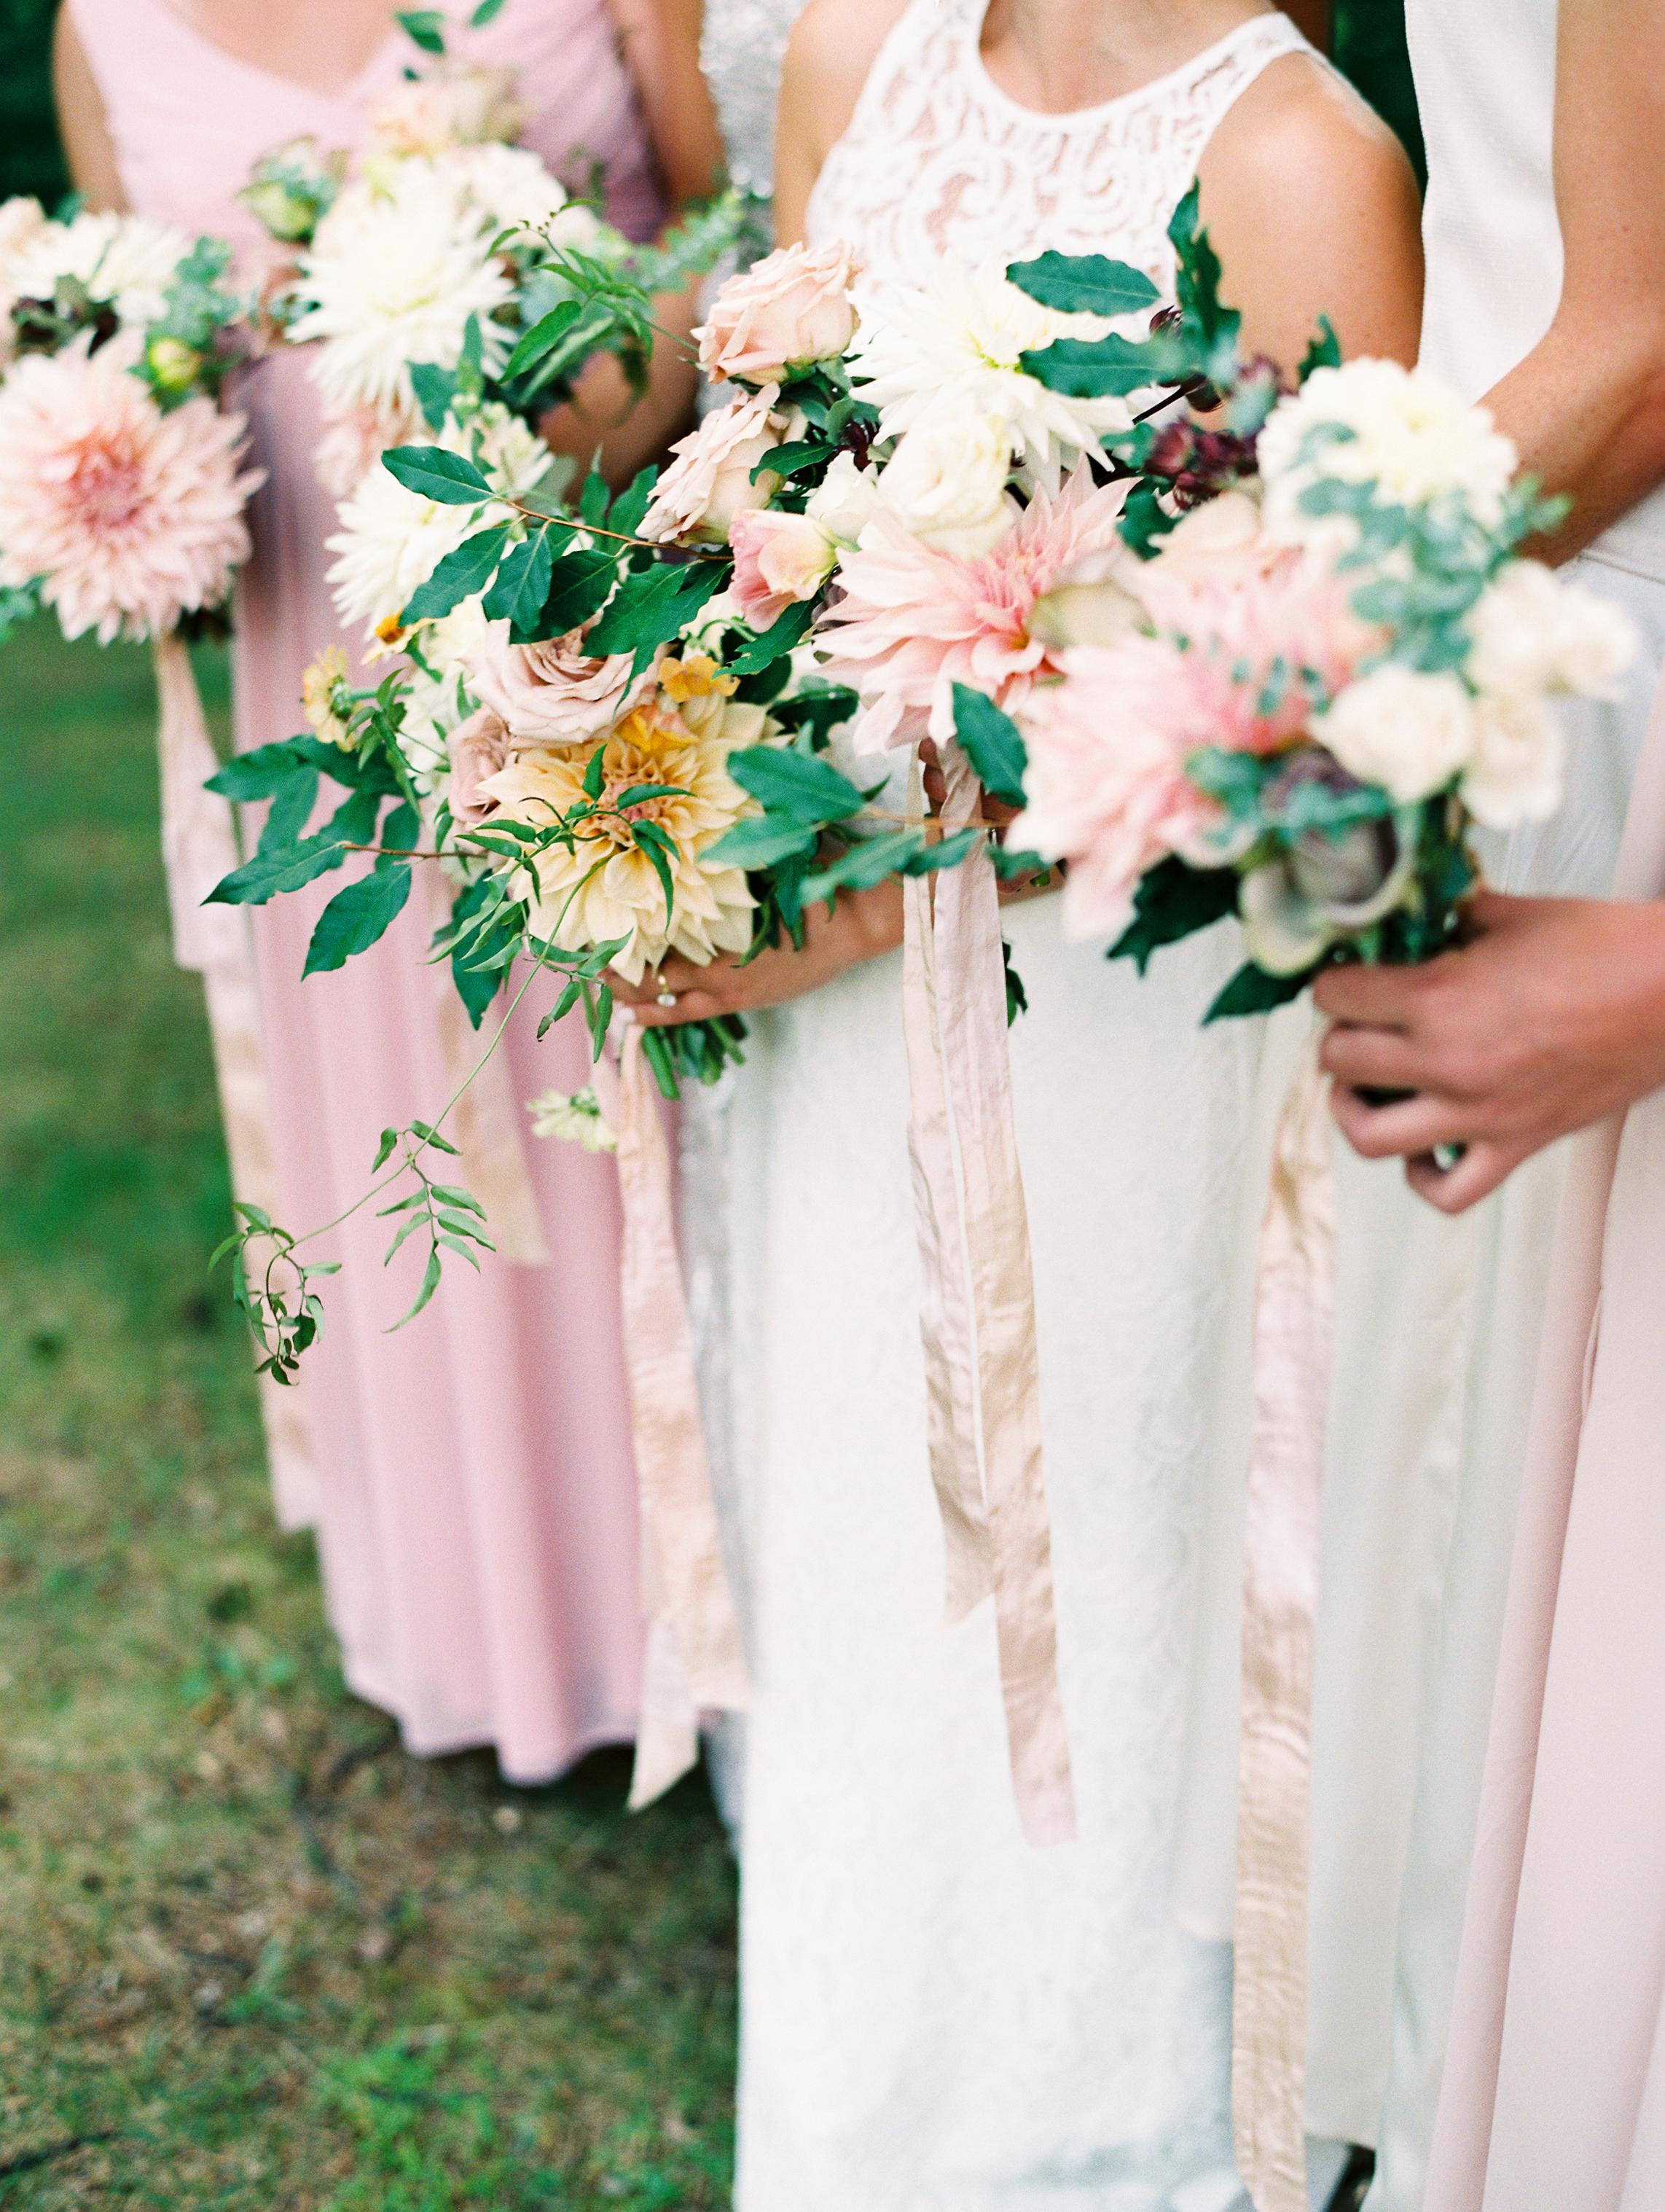 Zoller+Wedding+Bridal+Partyf-90.jpg